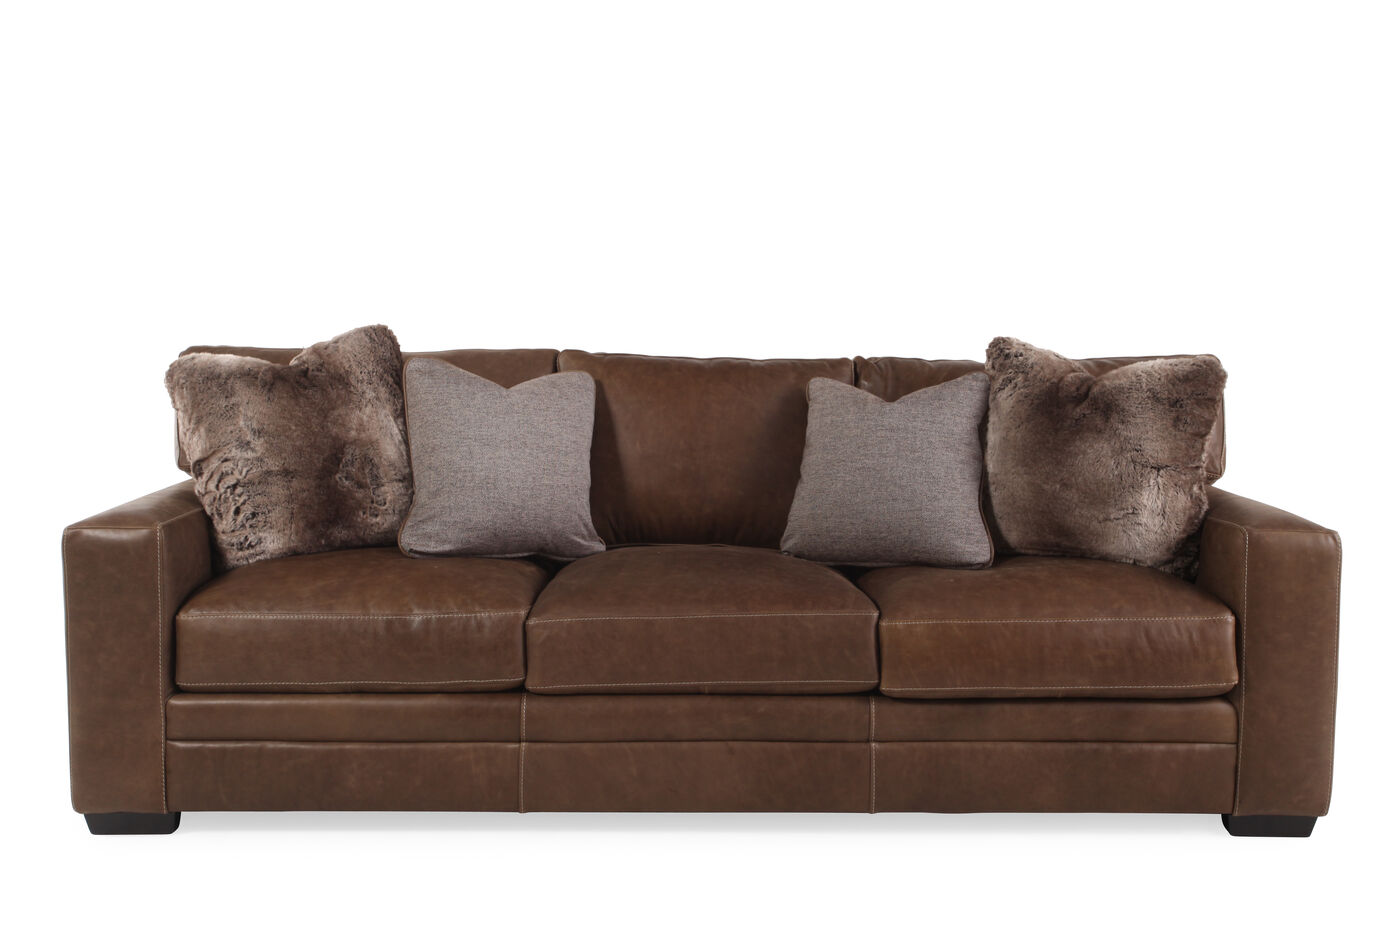 Bernhardt Tolbert Leather Sofa